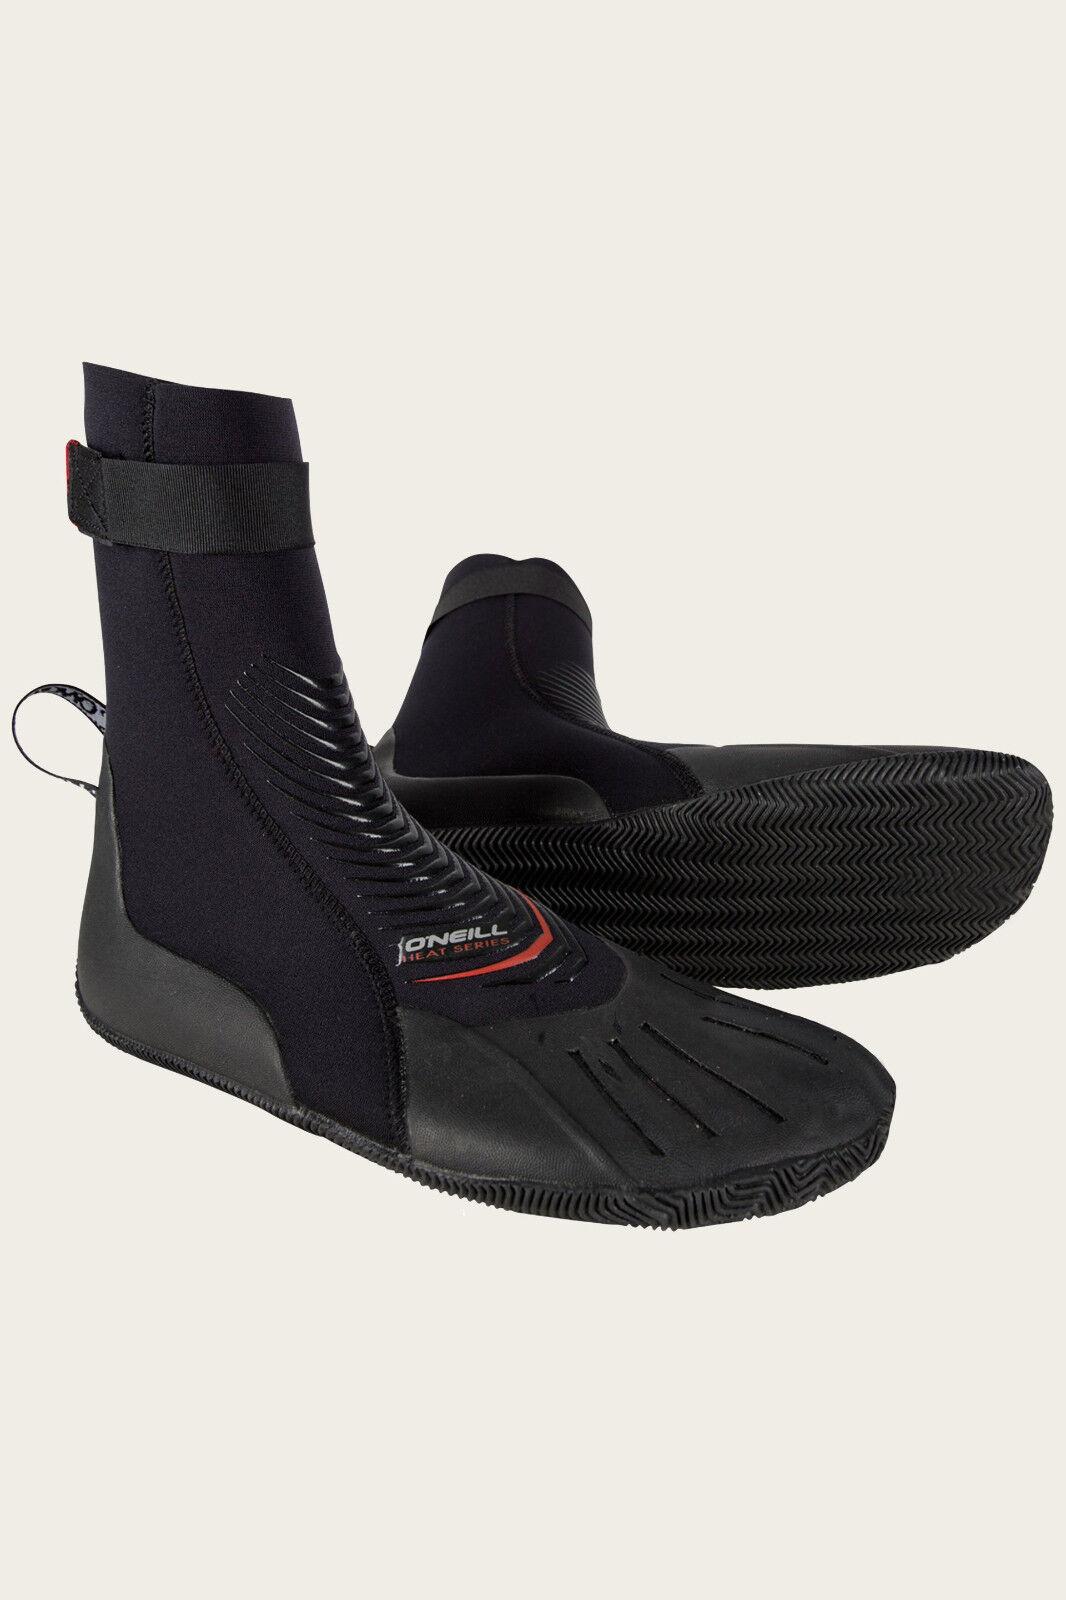 O'Neill Heat 3mm Round Toe Surf Boots - 6